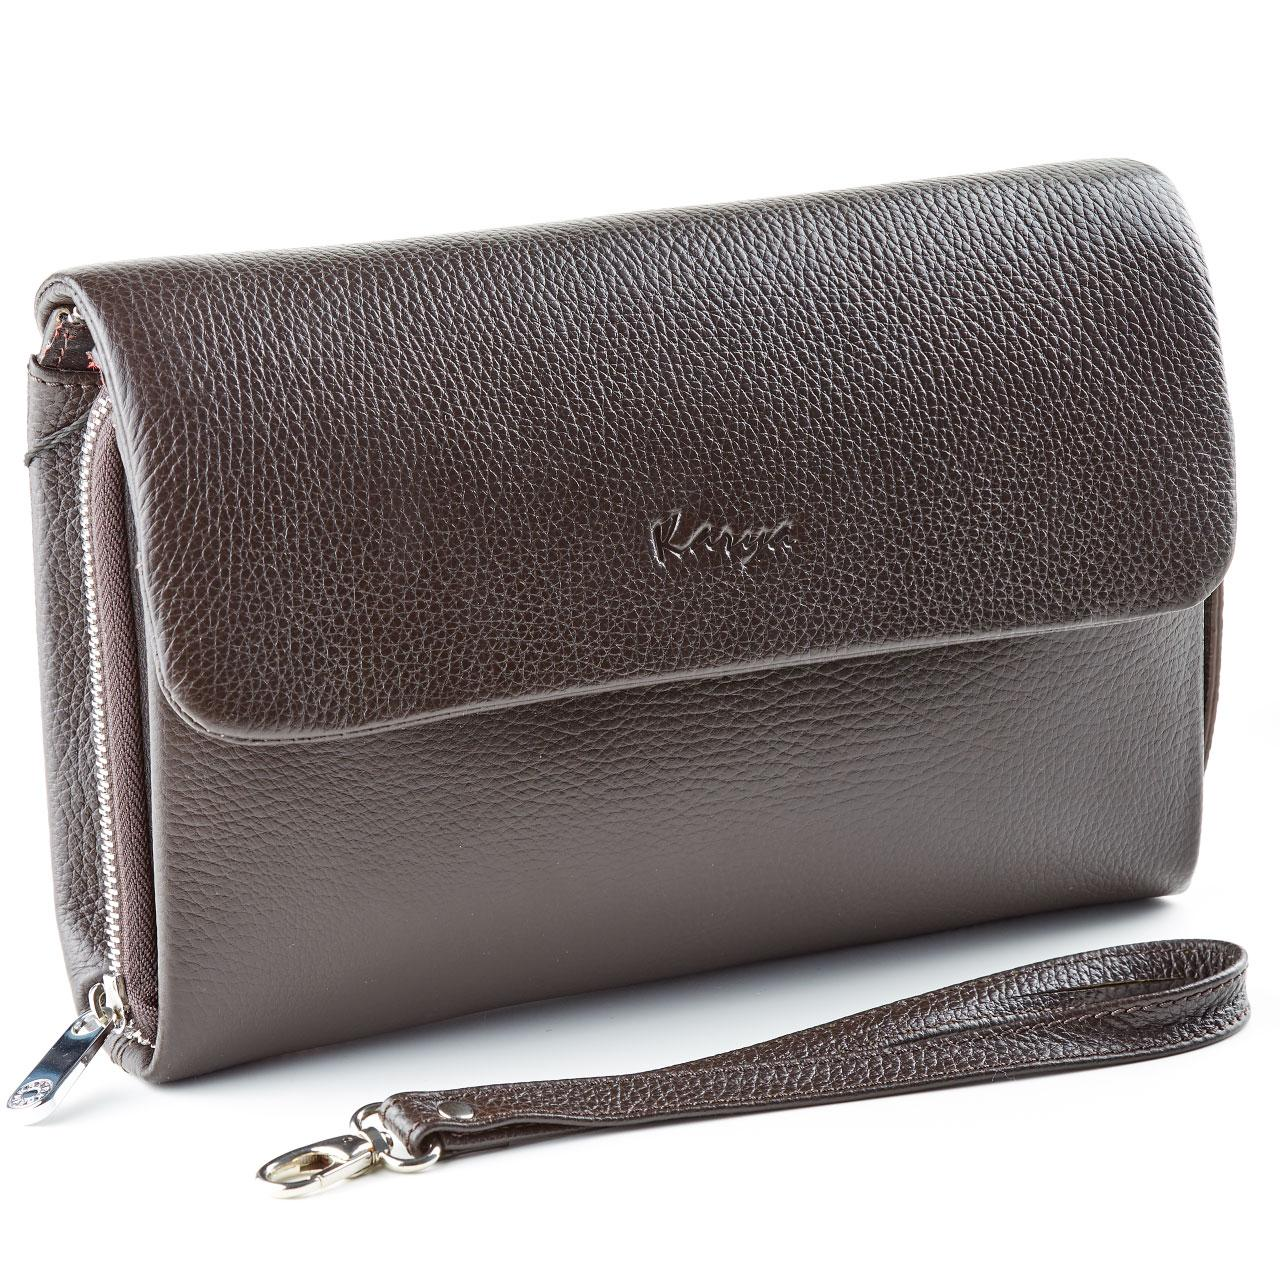 Мужская сумка барсетка Karya 0361-39 кожаная коричневая